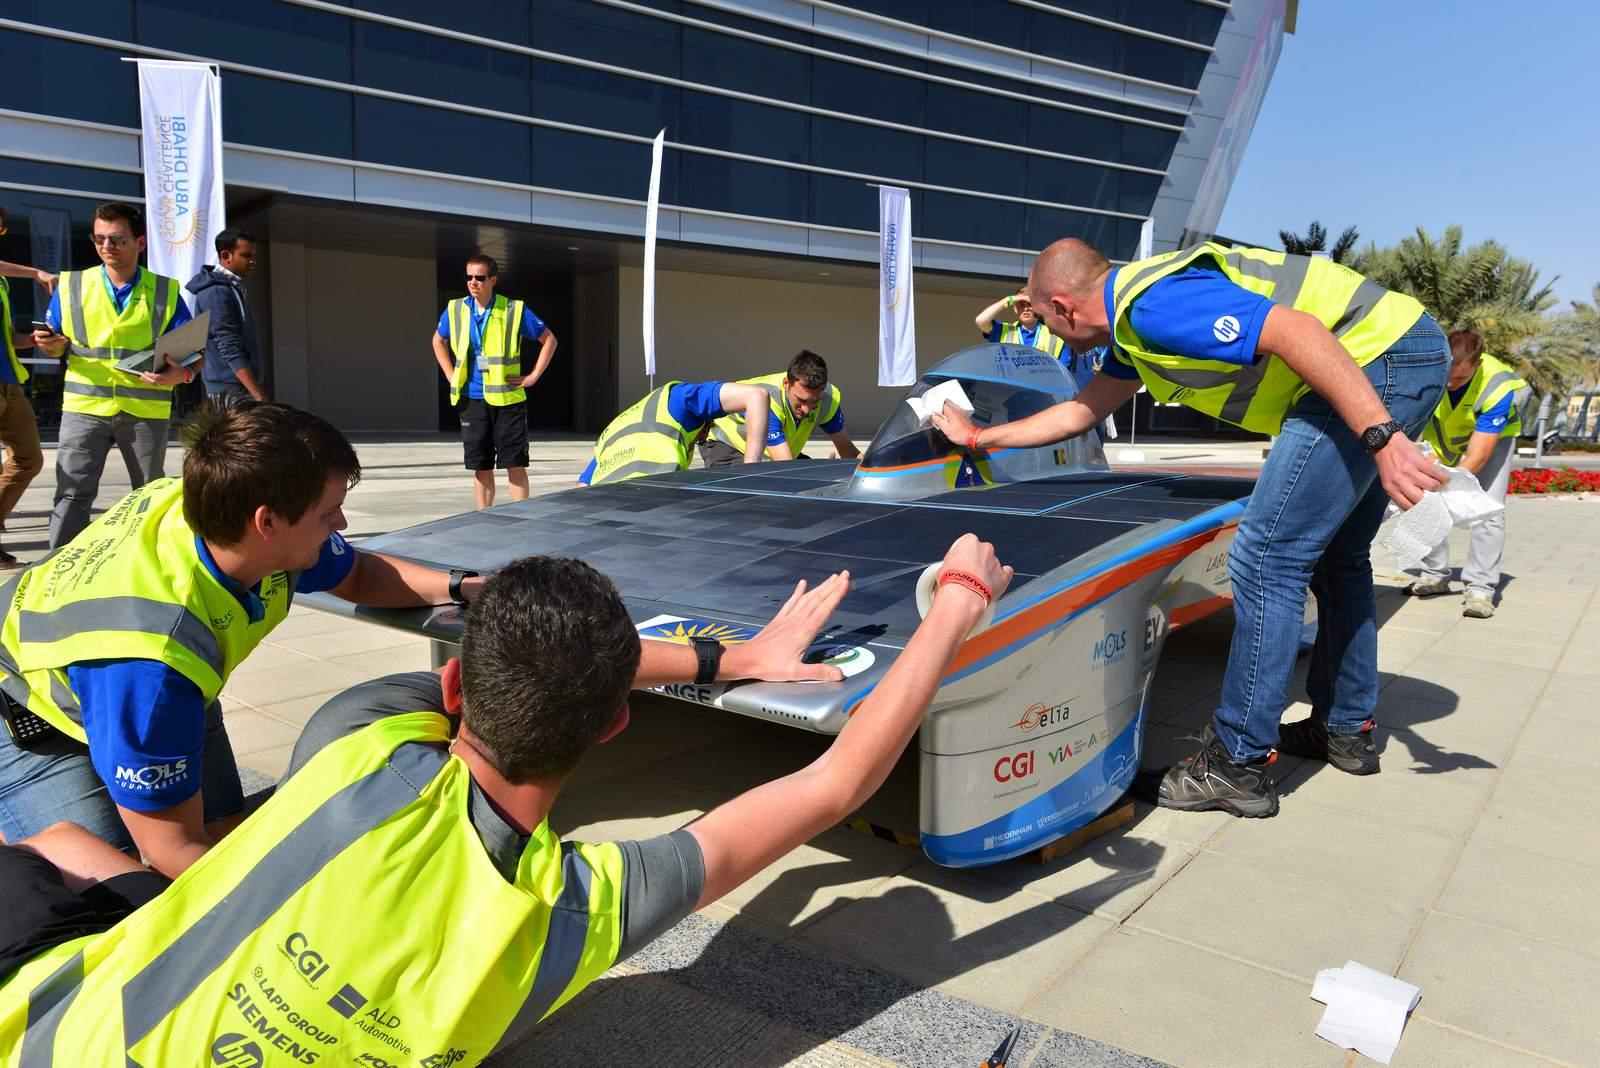 solar challenge7 Abu Dhabi Solar Challenge   Victory for Michigan University Team